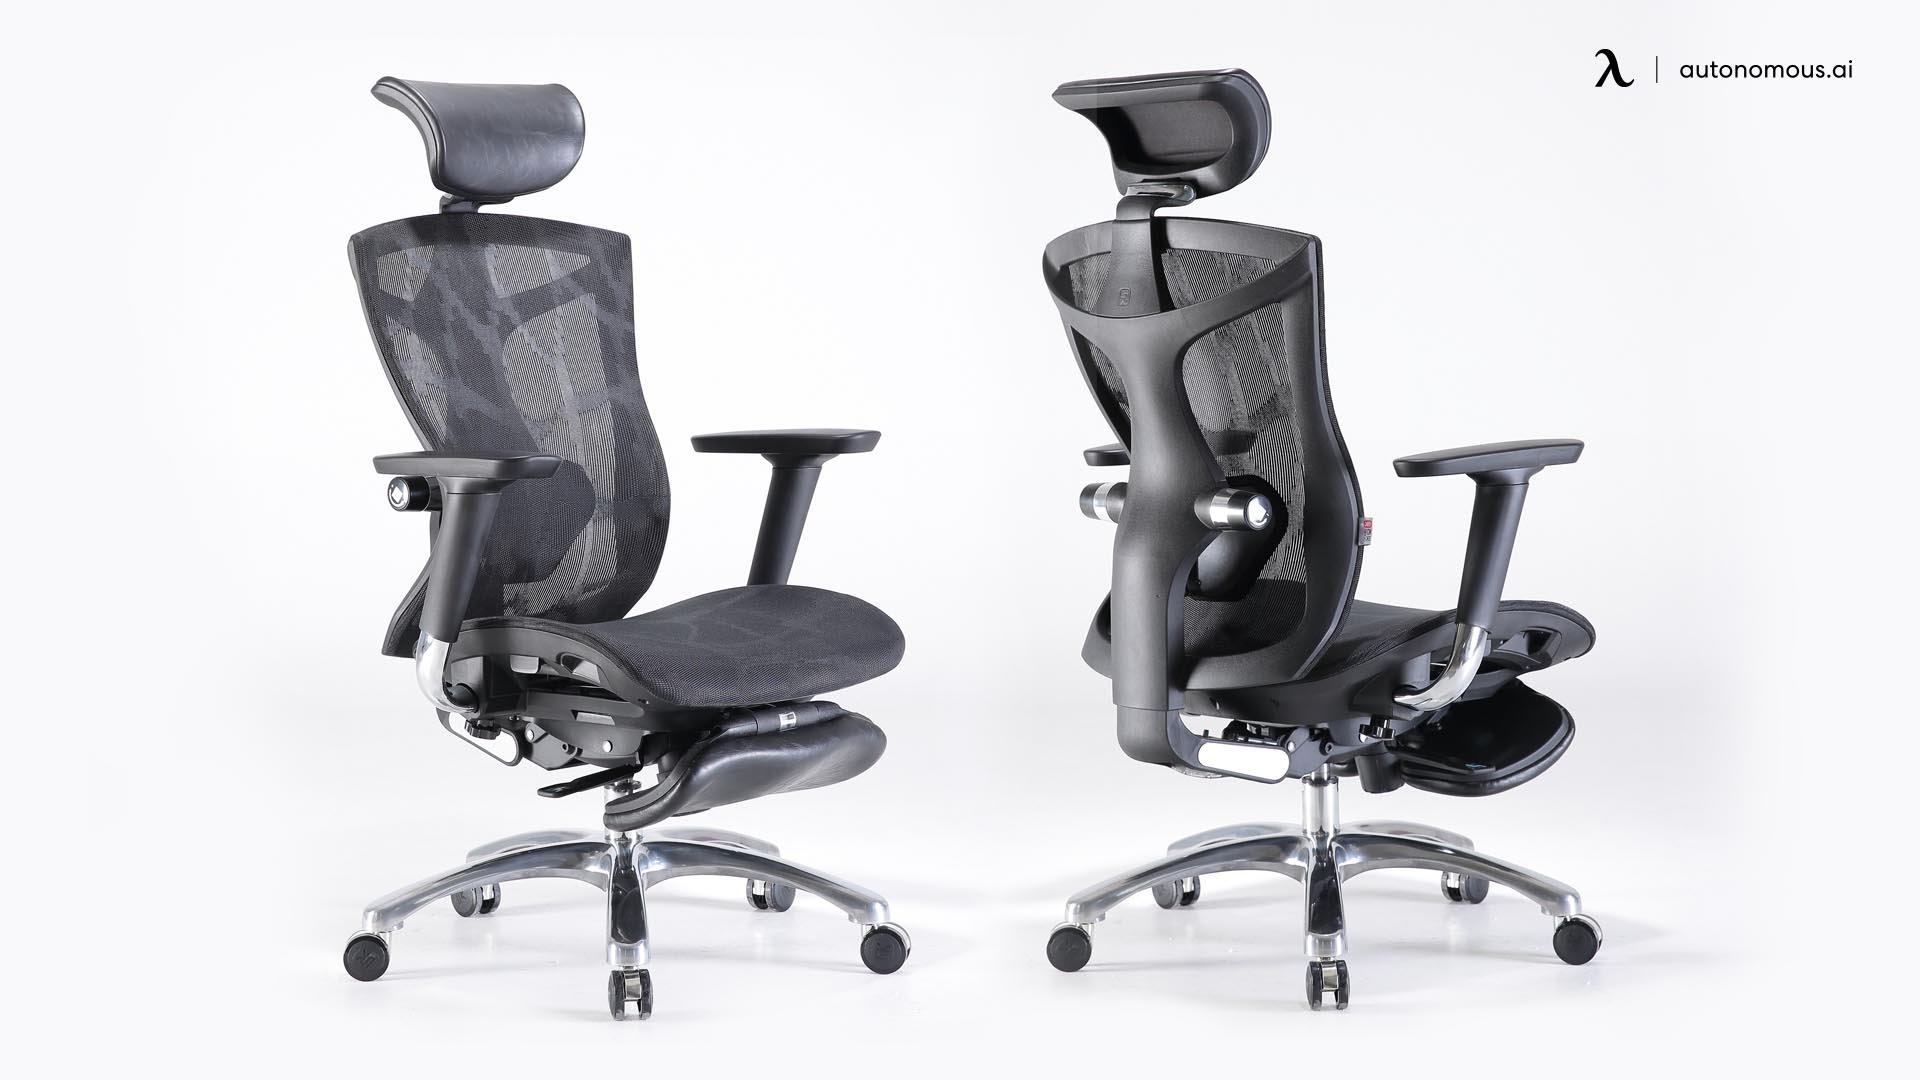 Shop Ergonomic Office Chair